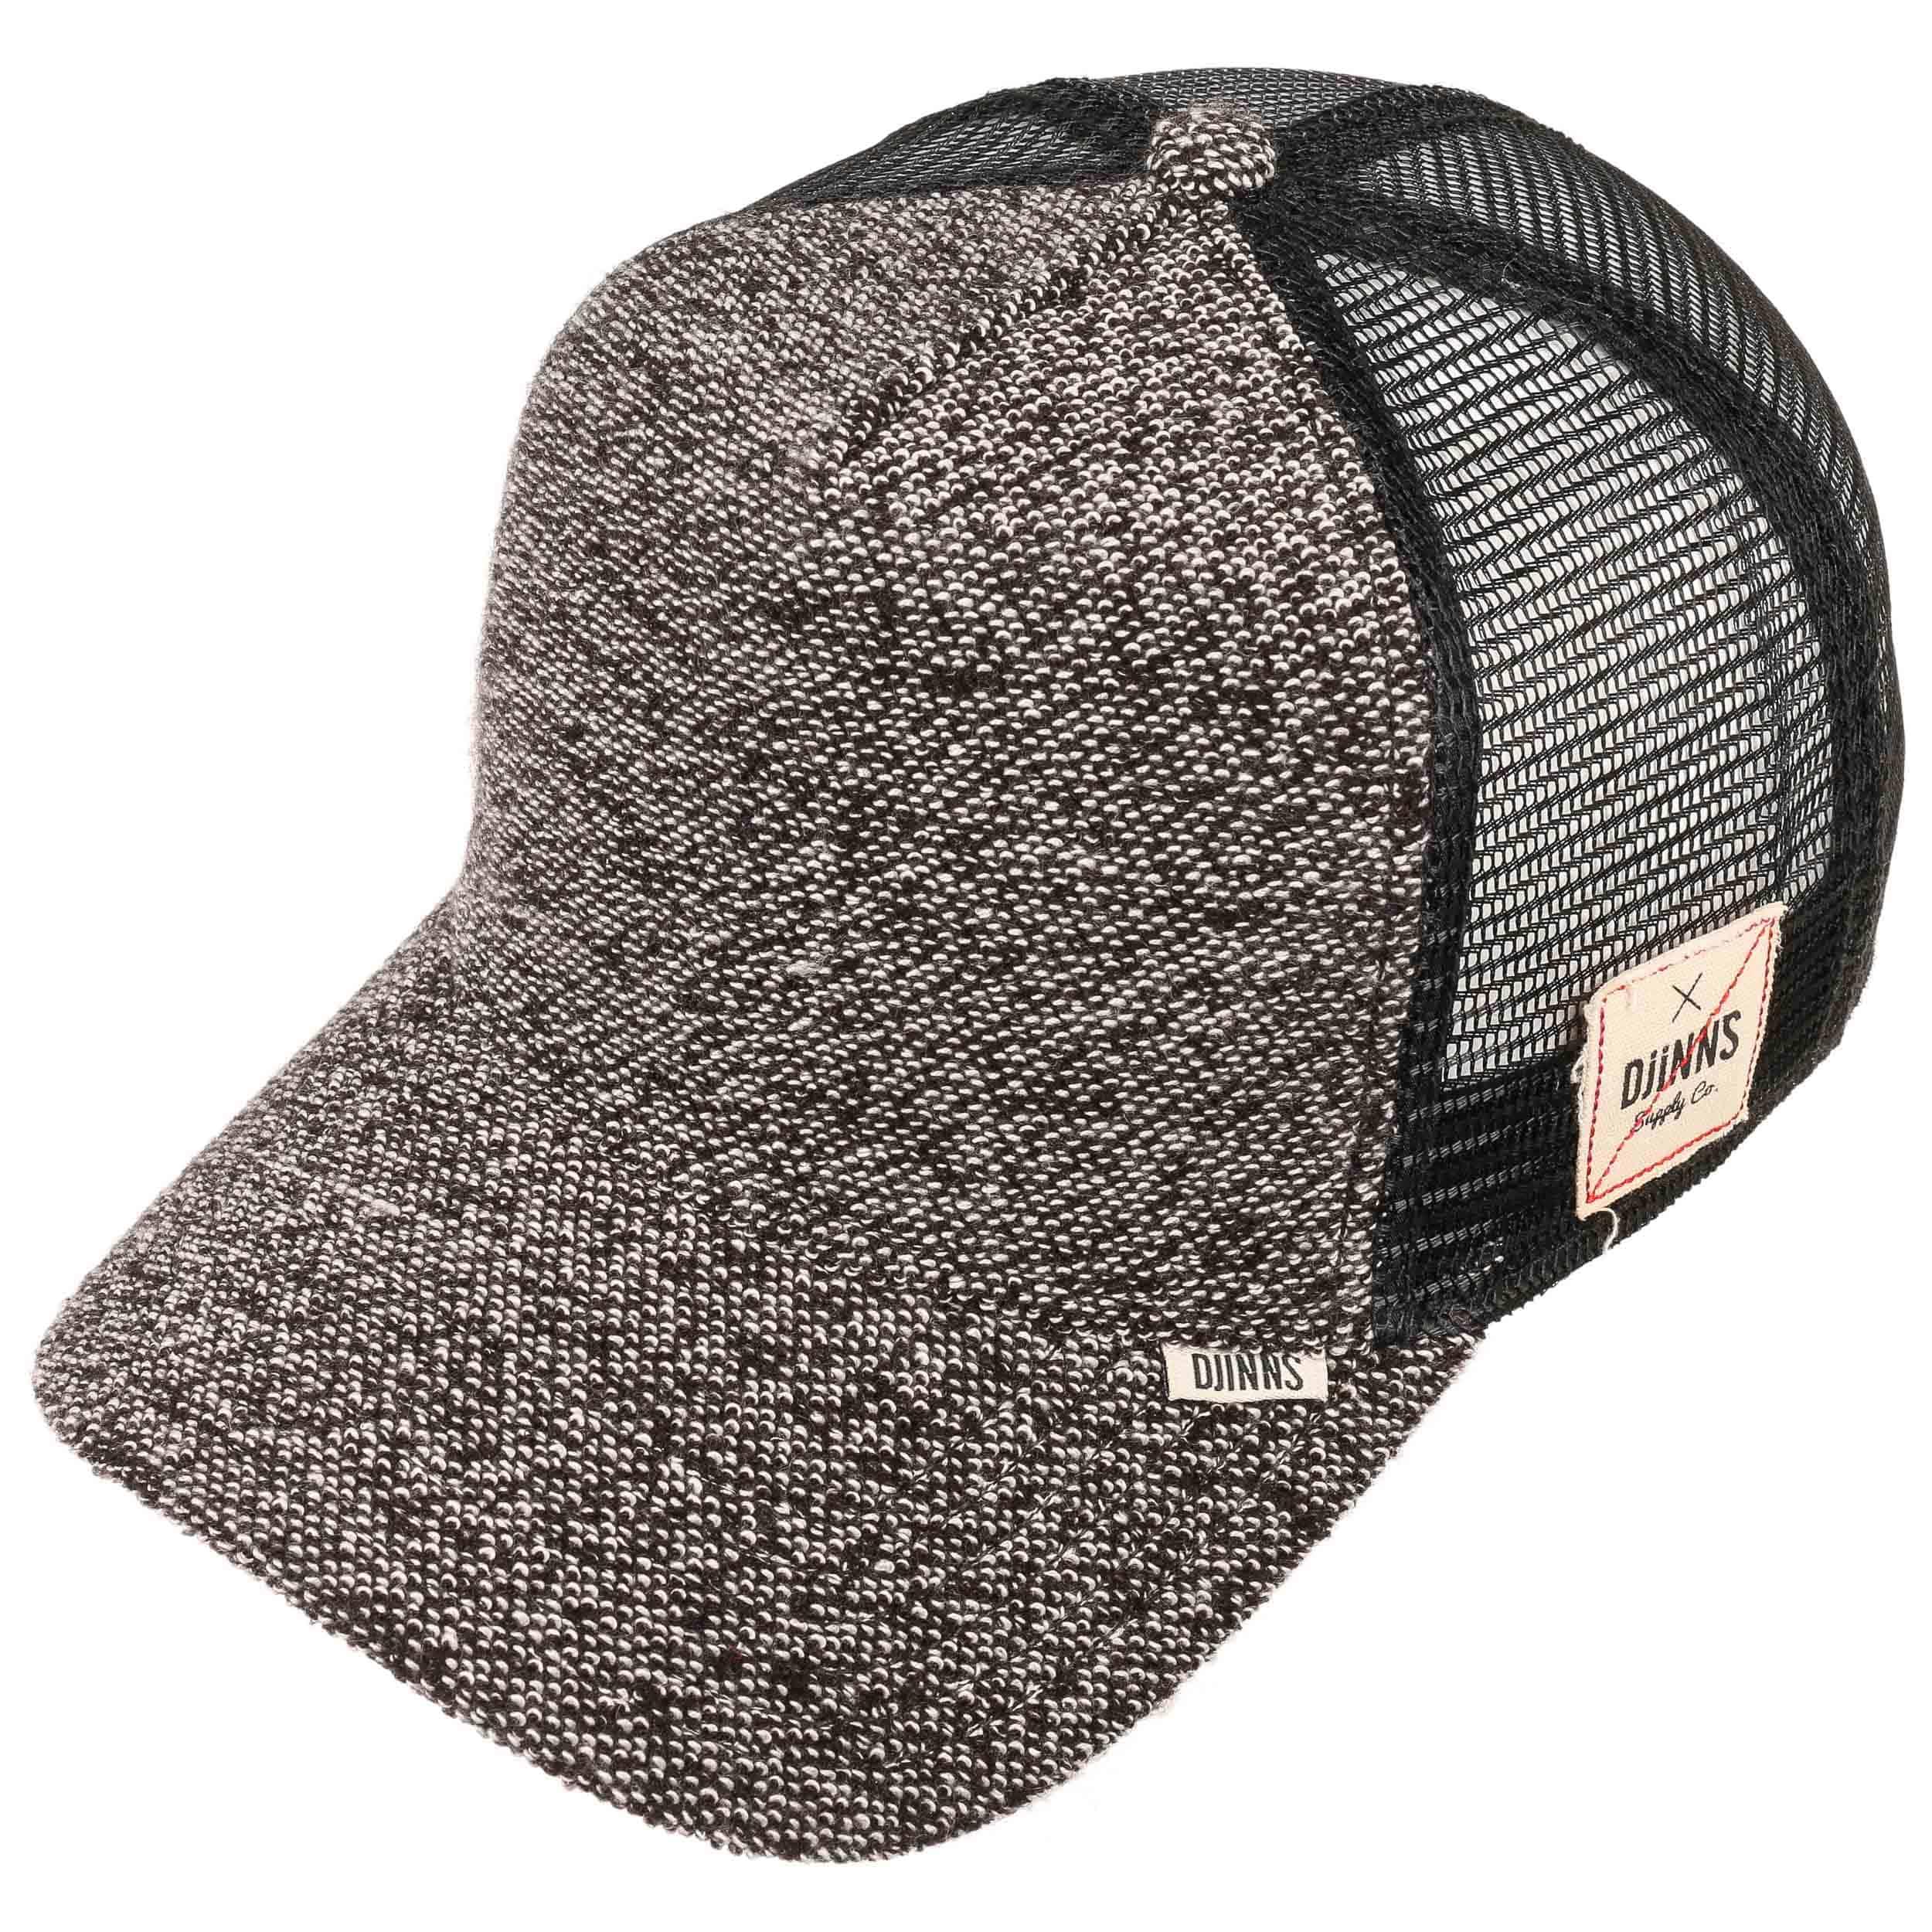 rip jersey hft trucker cap by djinns eur 21 99 hats. Black Bedroom Furniture Sets. Home Design Ideas